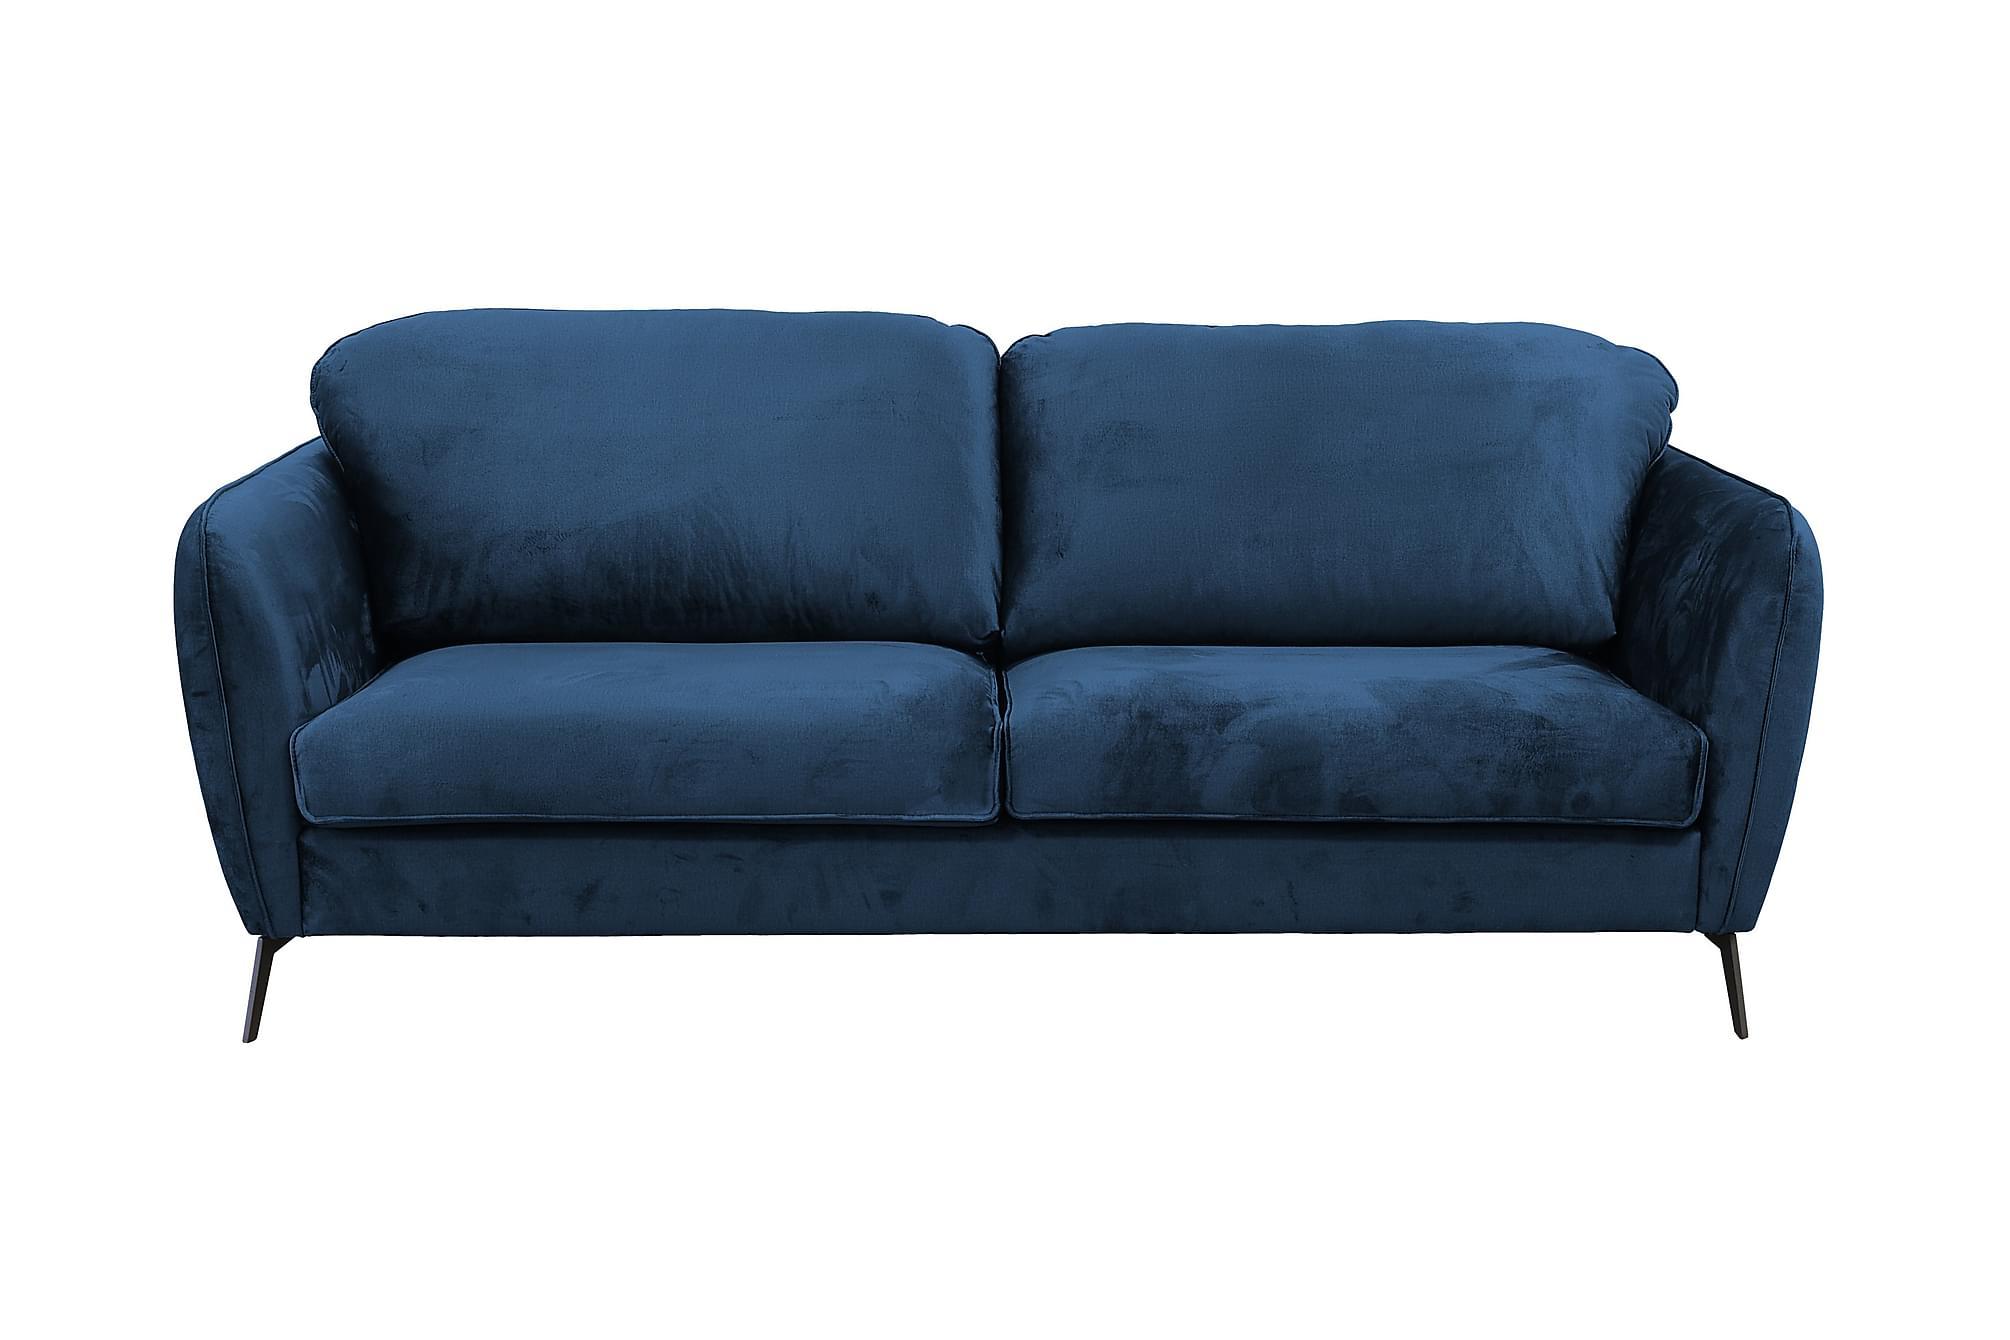 BRUVIK 3-sits Soffa Blå